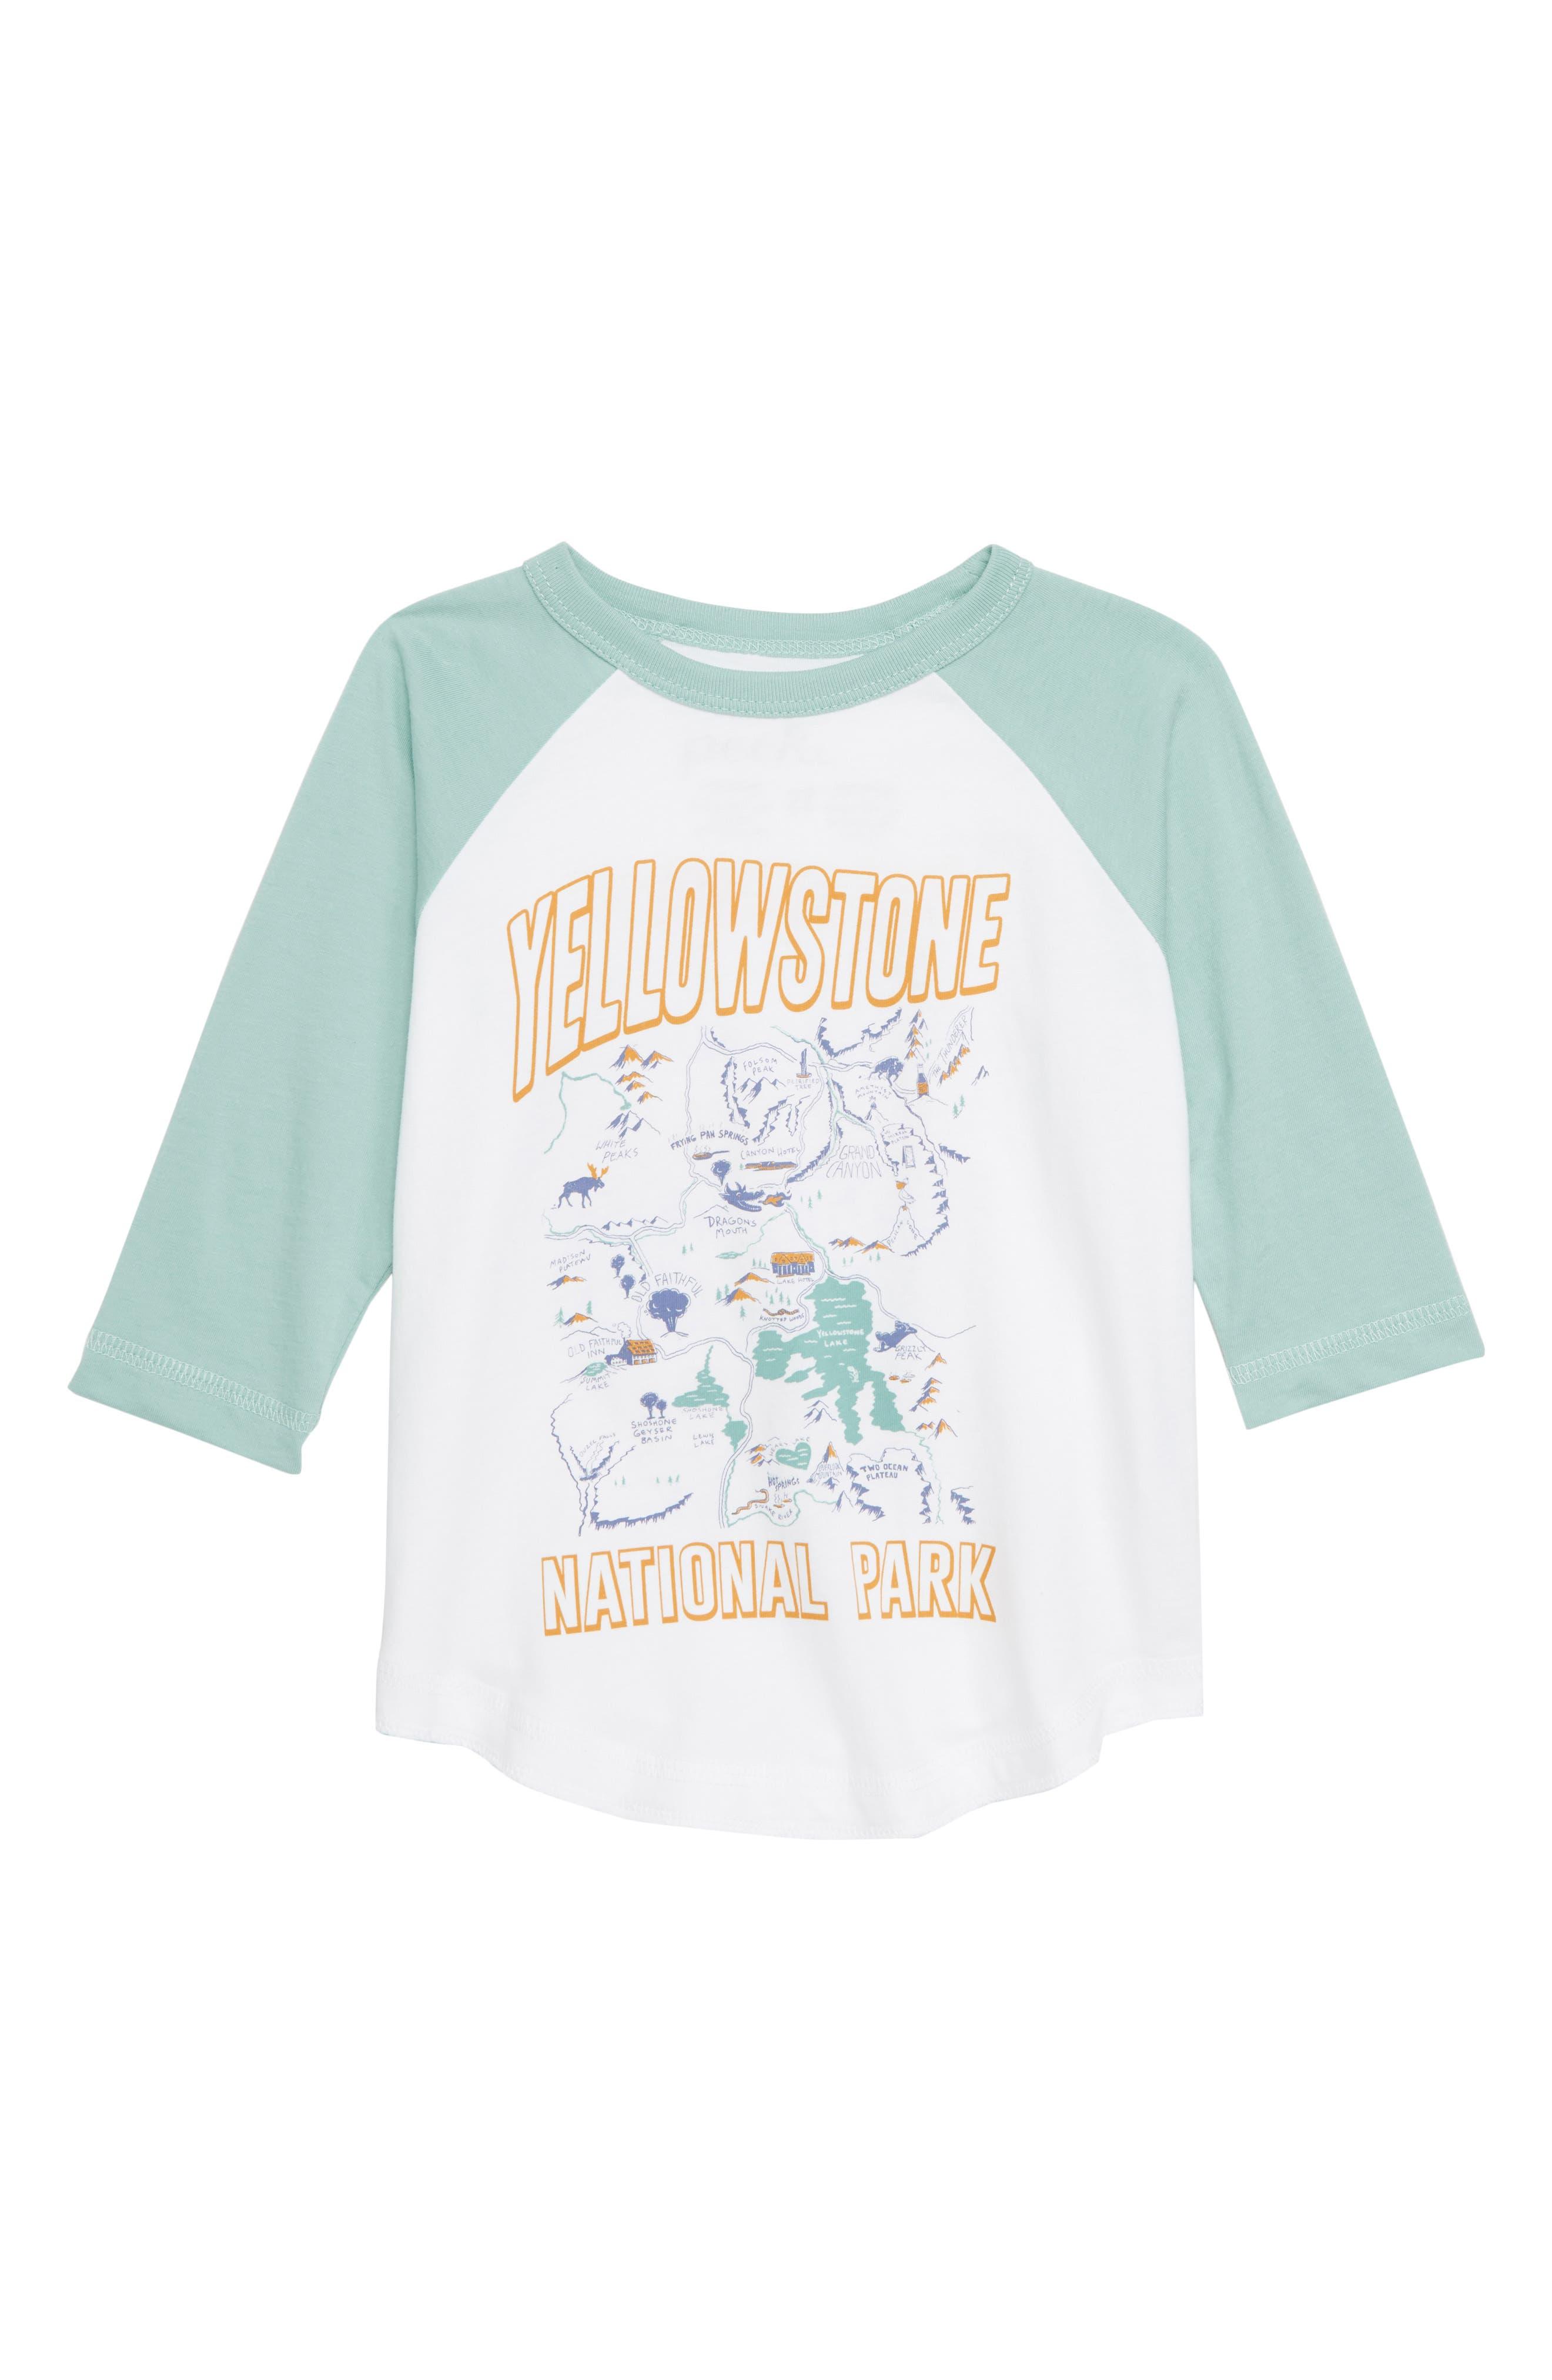 Yellowstone National Park Graphic T-Shirt,                             Main thumbnail 1, color,                             WHITE